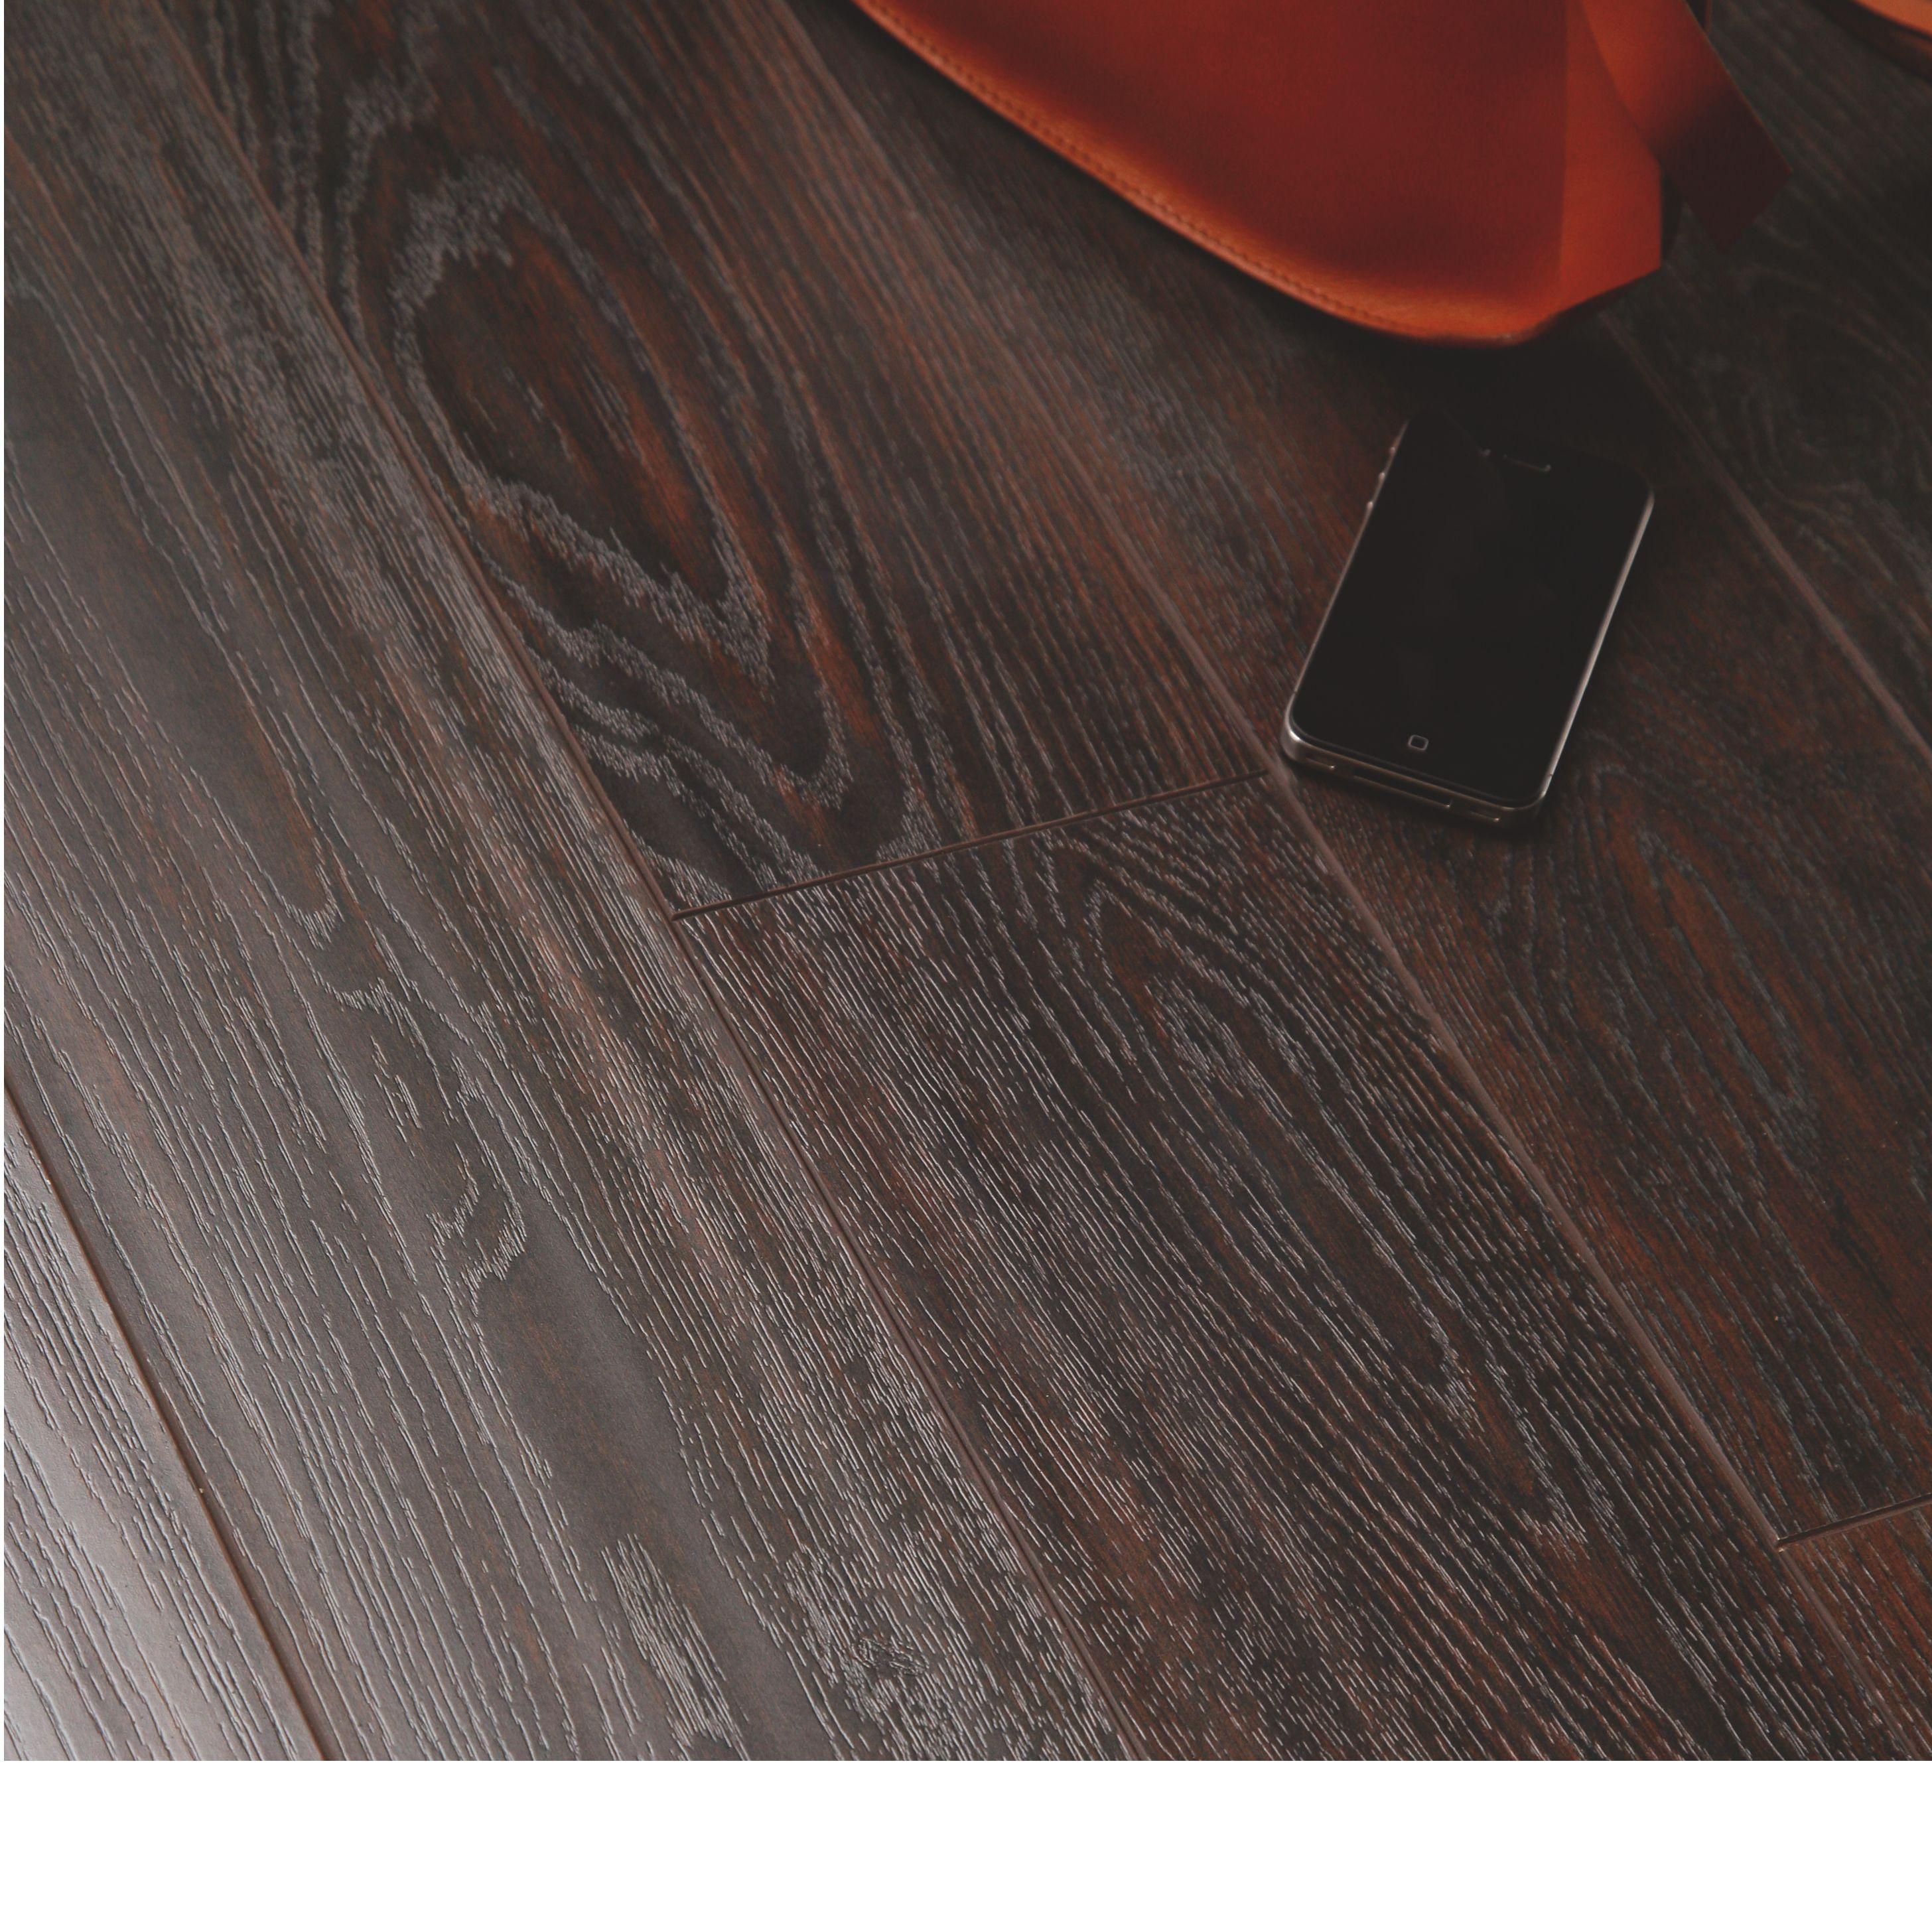 Dolce Richmond Dark Oak Effect Laminate Flooring 1 37 M Pack Departments Diy At B Q Solid Wood Flooring Flooring Laminate Flooring